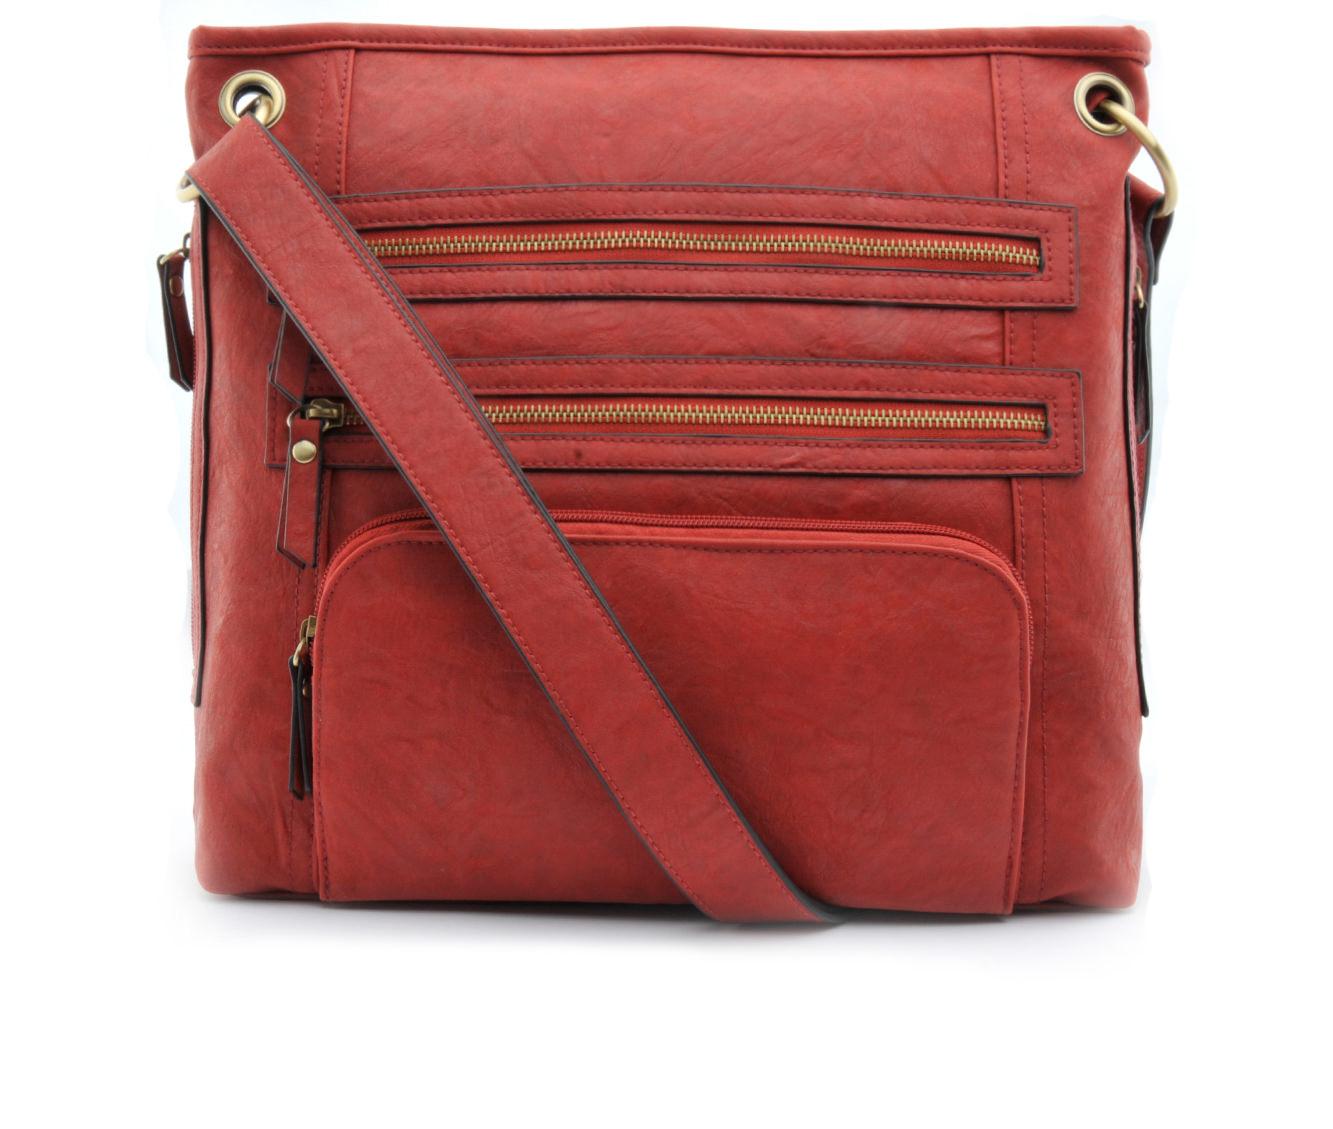 Image of Bueno Of California Large Crossbody Handbag (Red - Size UNSZ)